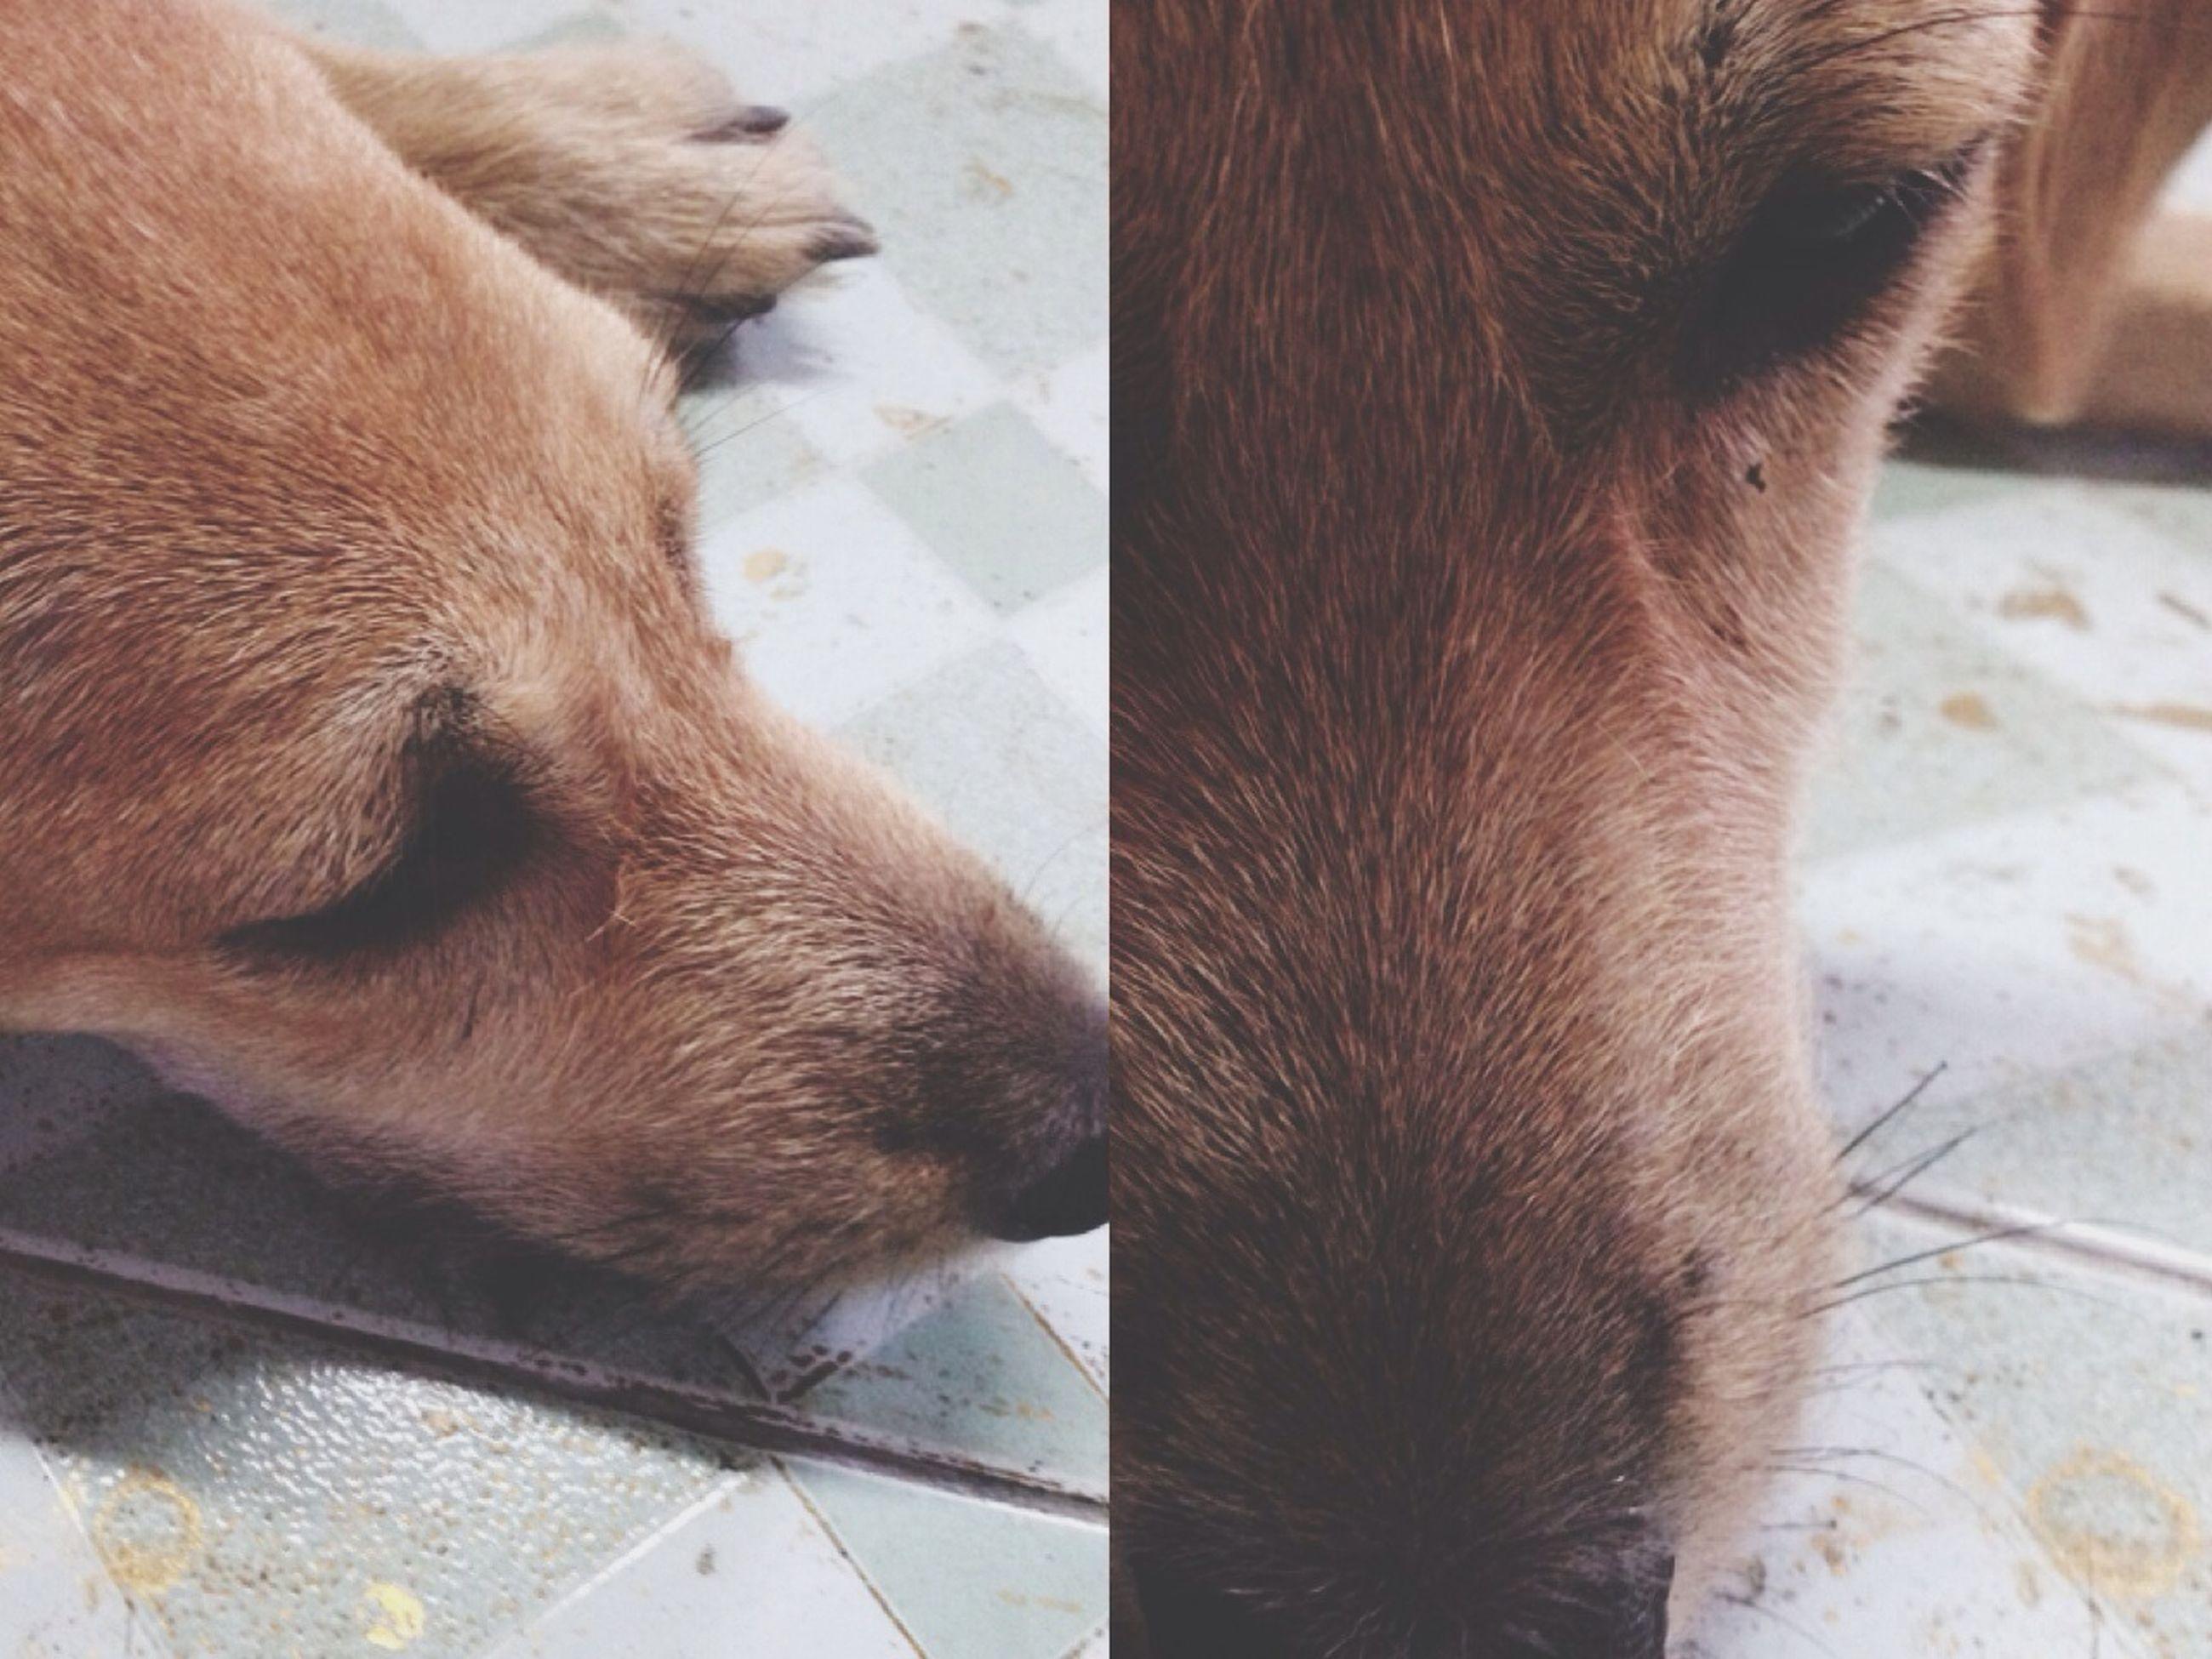 animal themes, domestic animals, mammal, one animal, animal head, animal body part, livestock, pets, indoors, close-up, part of, vertebrate, brown, two animals, animal, dog, zoology, horse, herbivorous, day